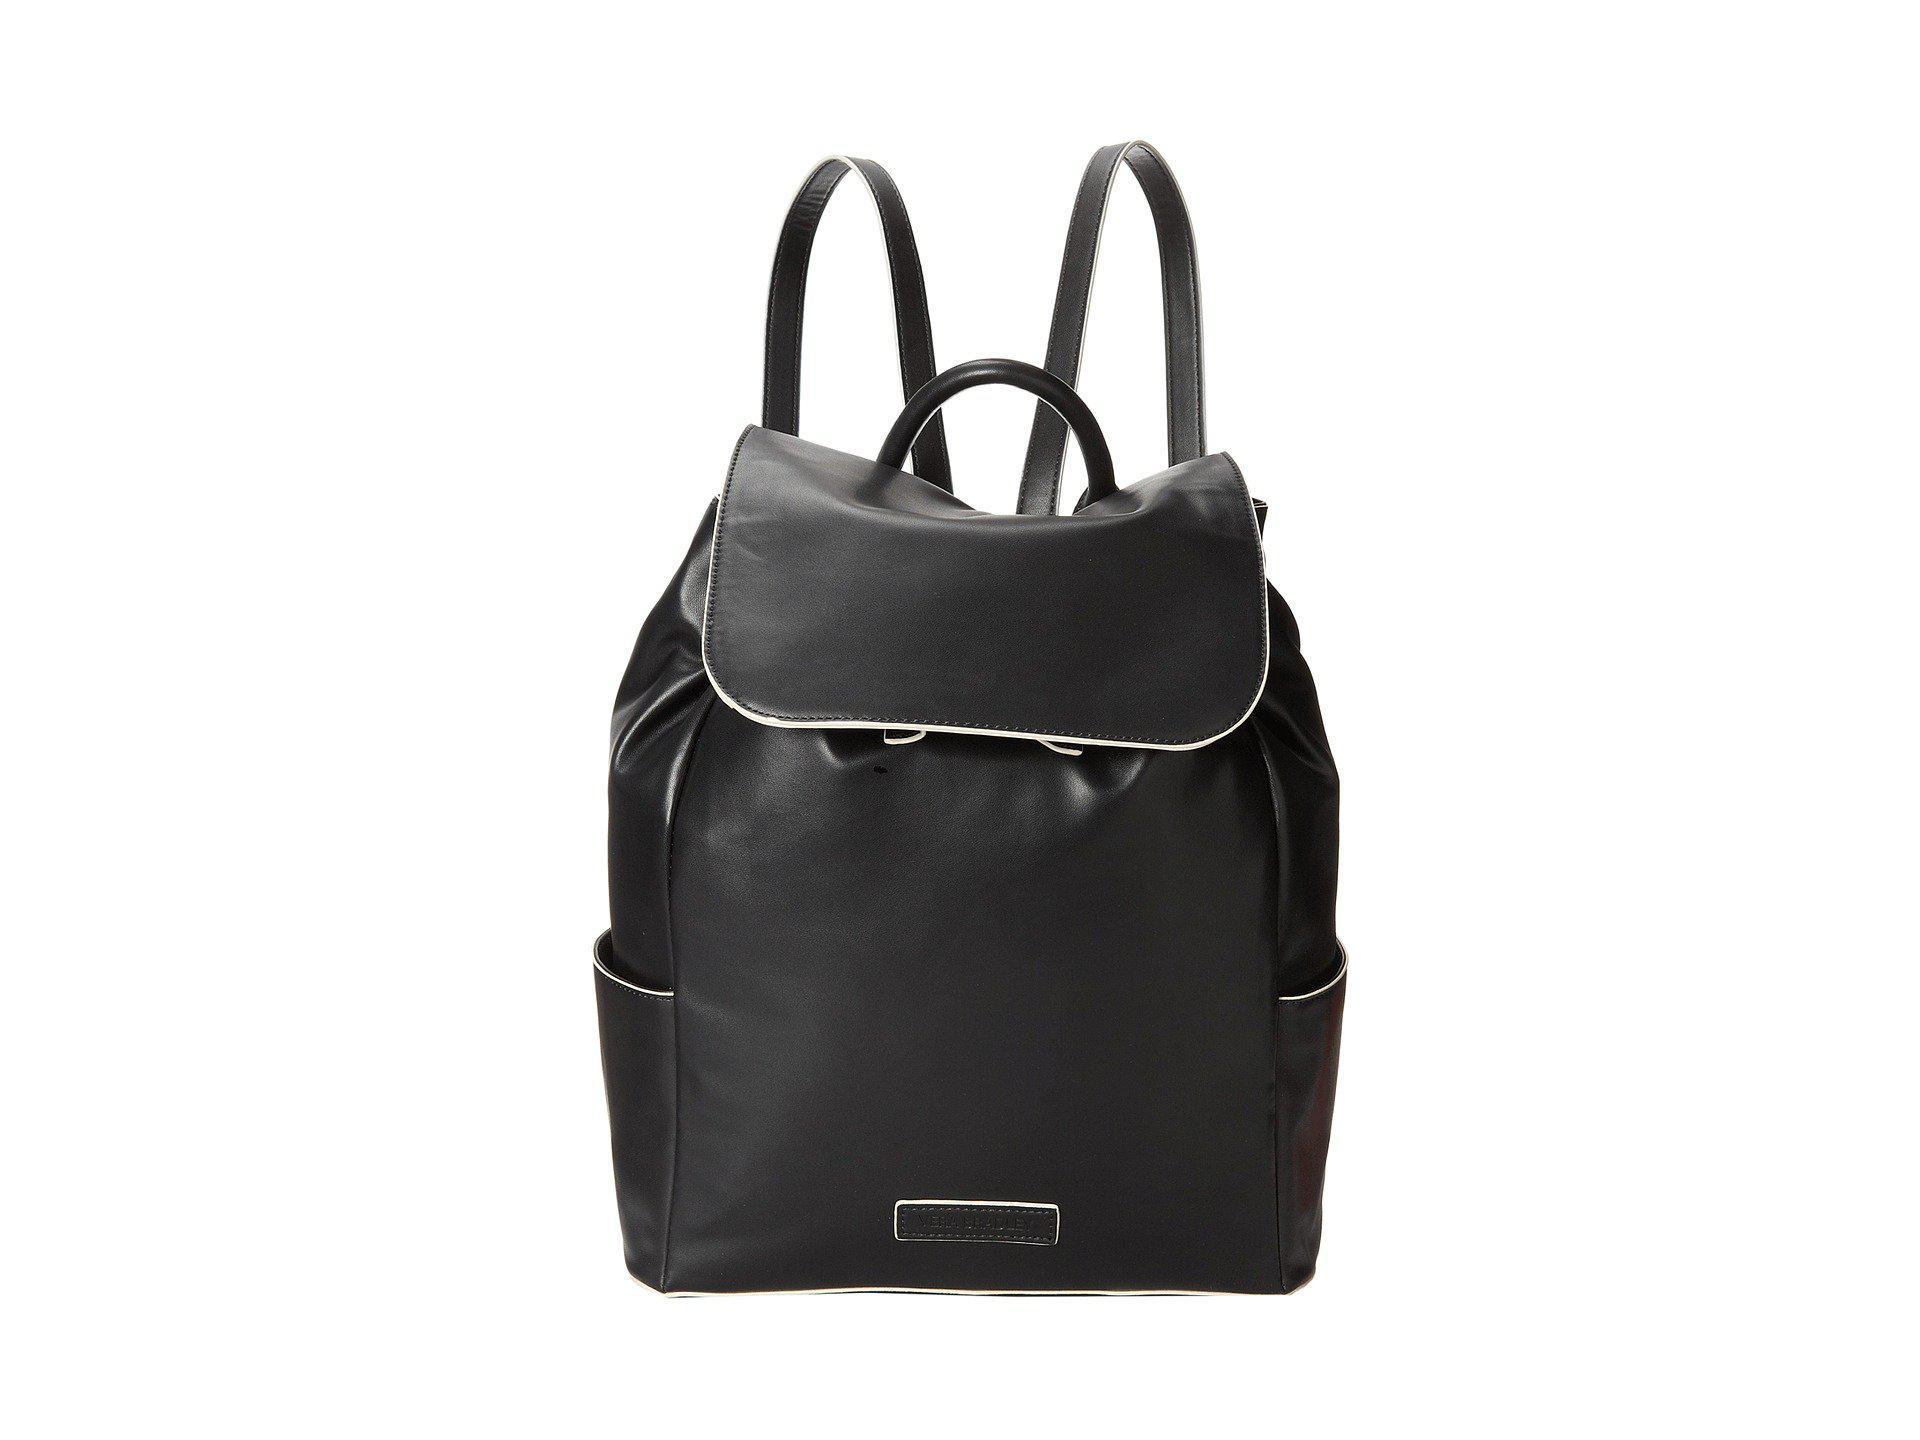 Lyst - Vera Bradley Faux Leather Backpack in Black b795b478b1